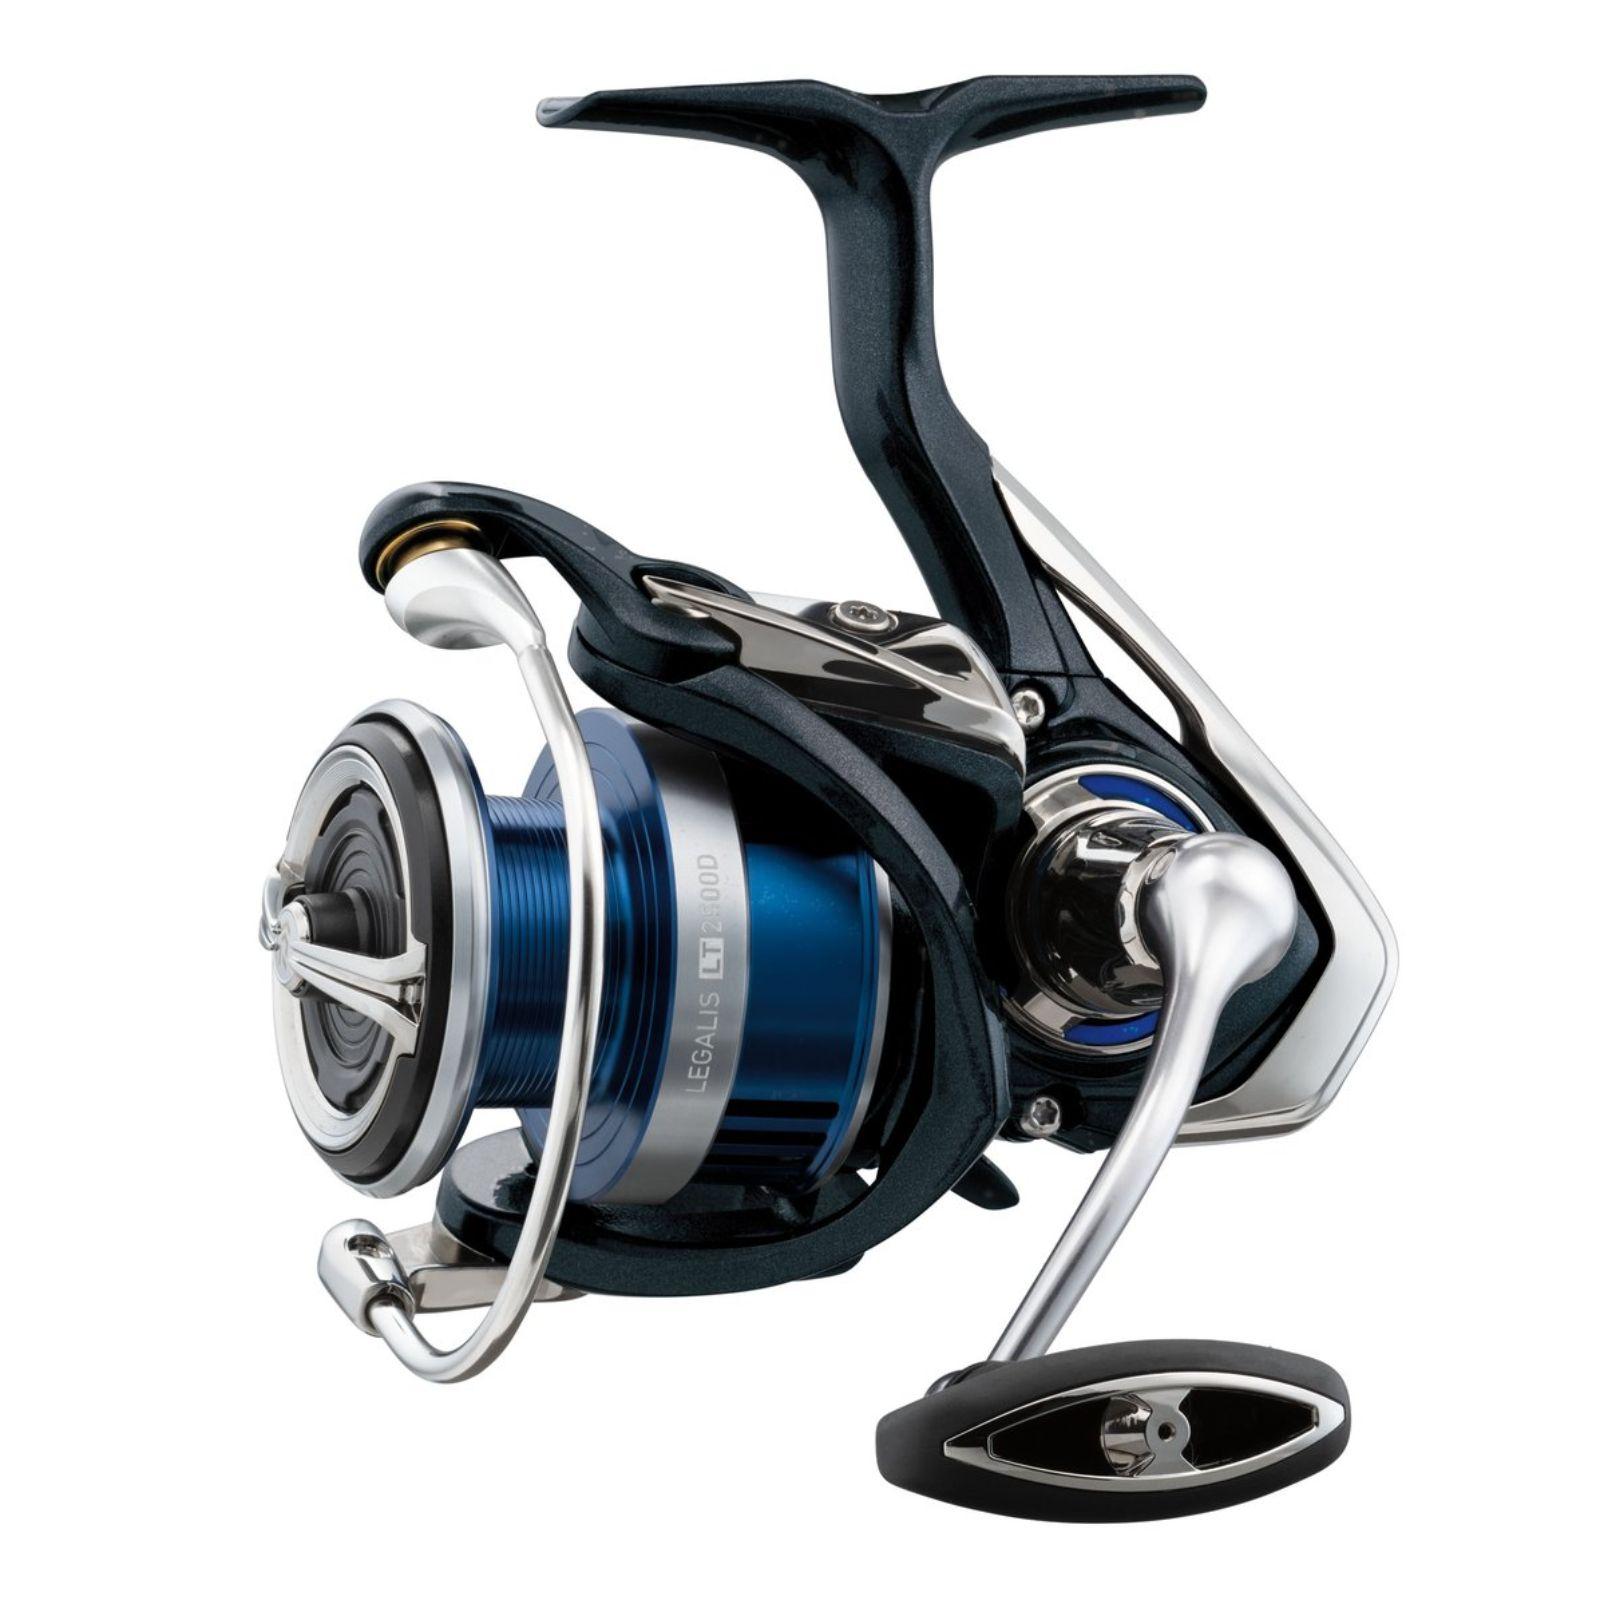 Daiwa Legalis LT 2500D Spinning Reel